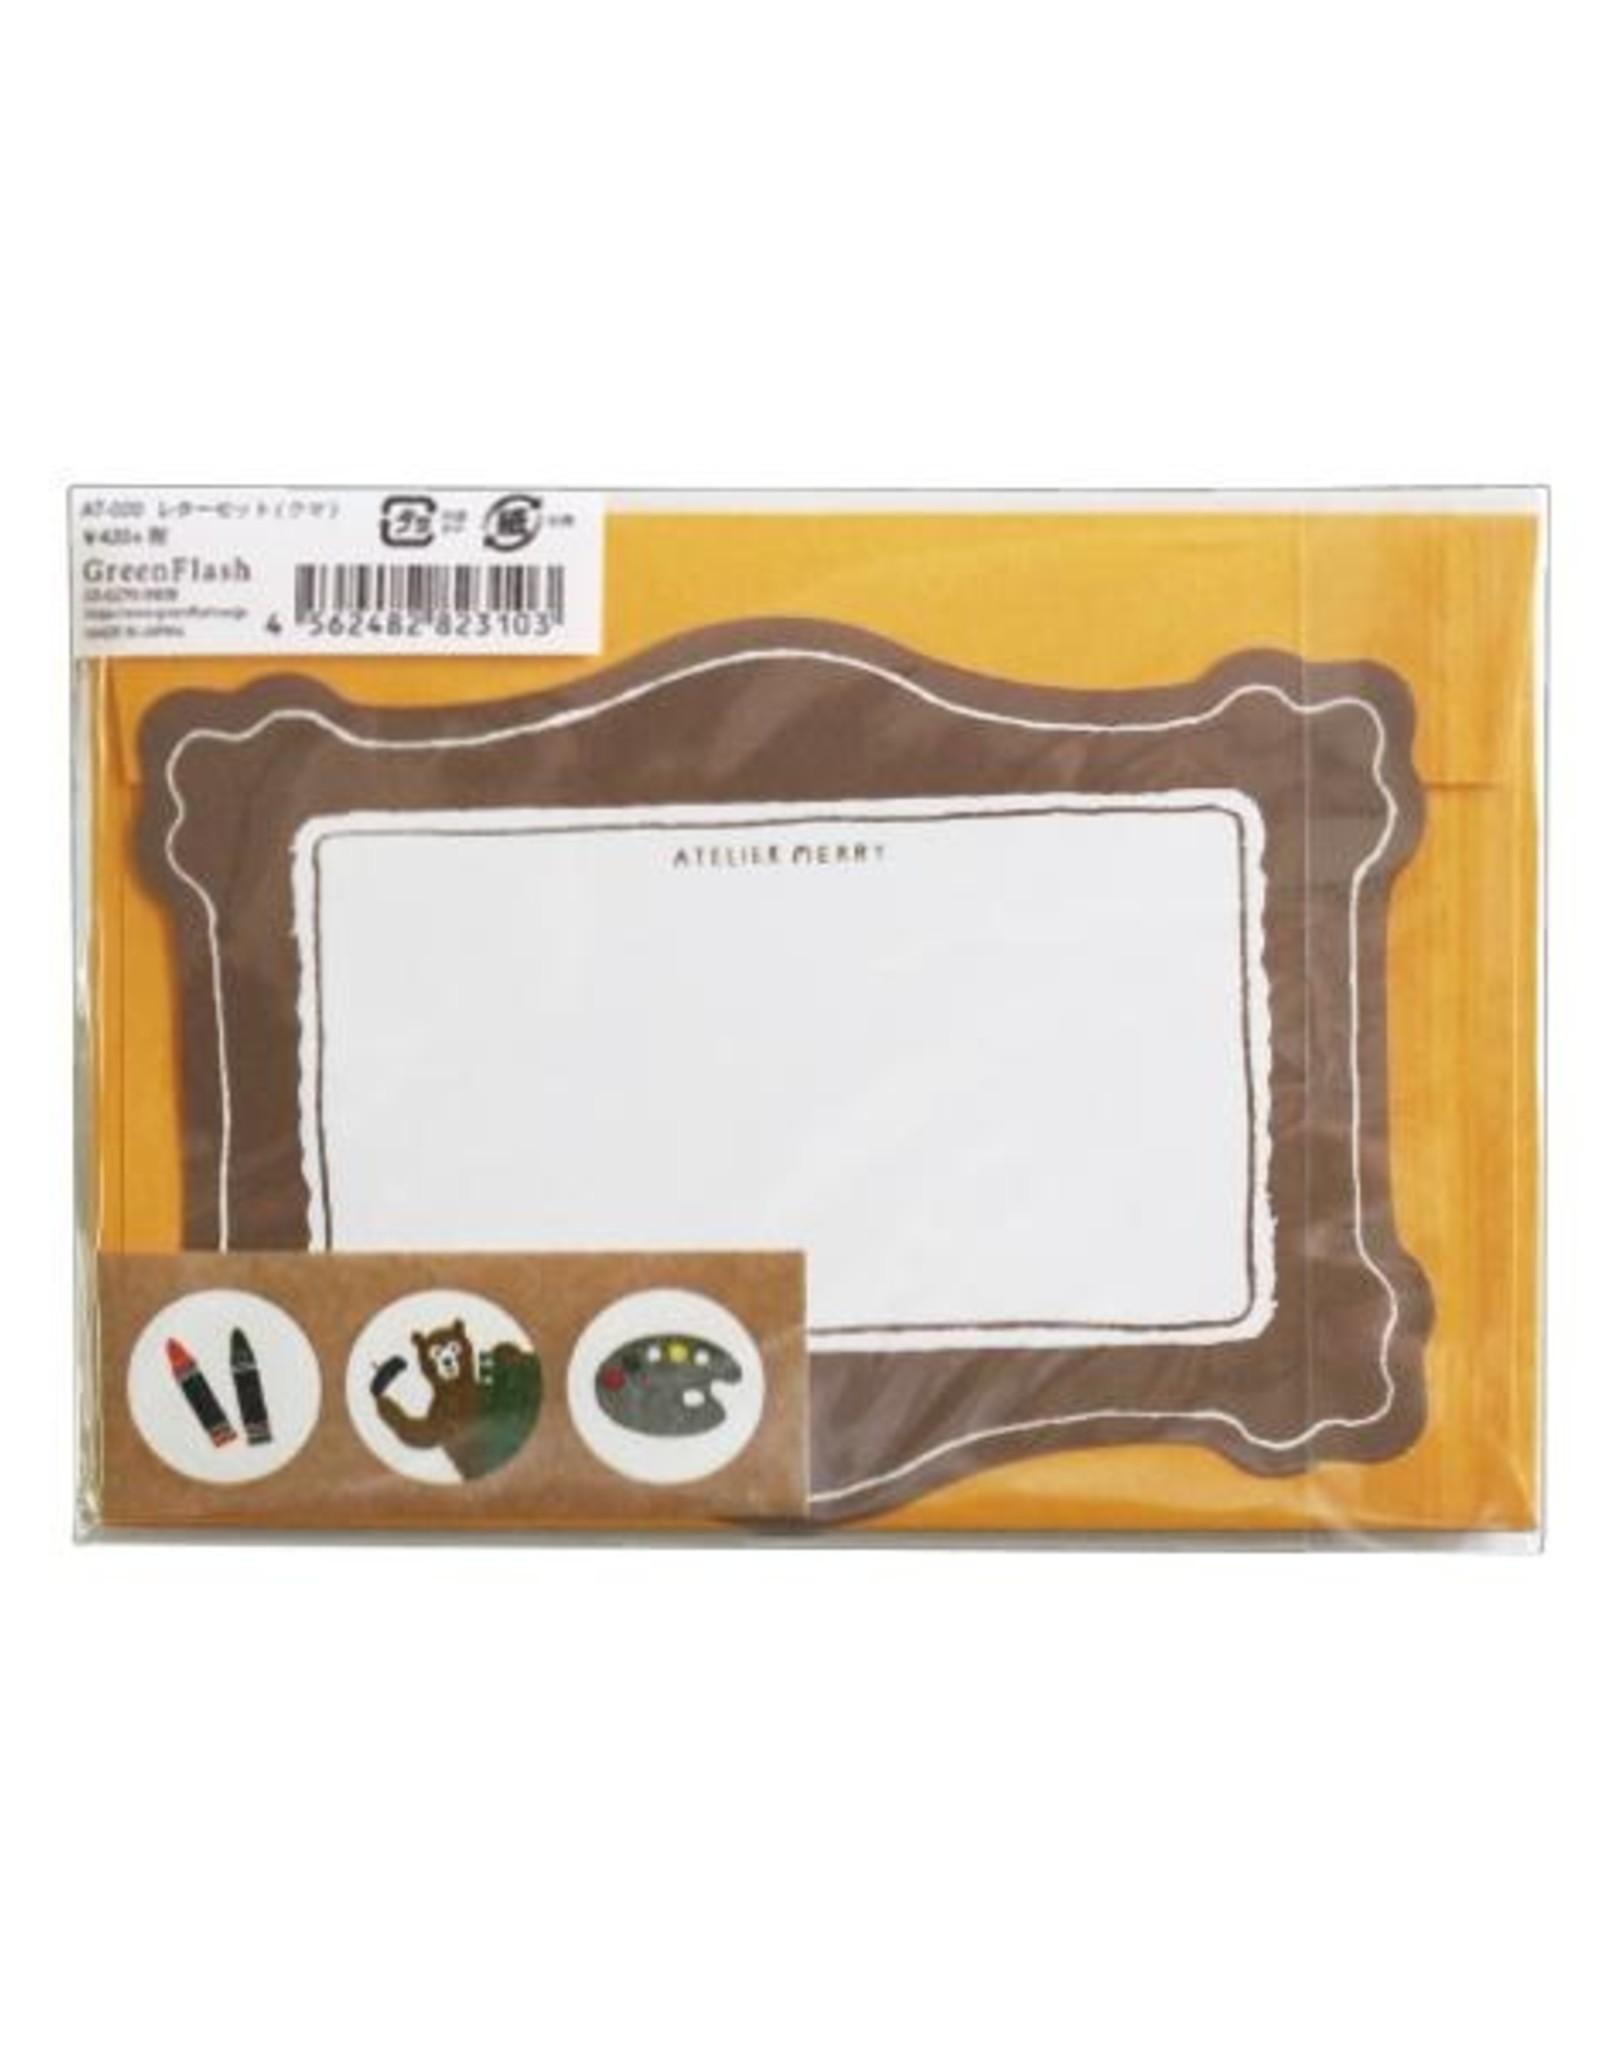 Green Flash Atelier Merry Letter Set